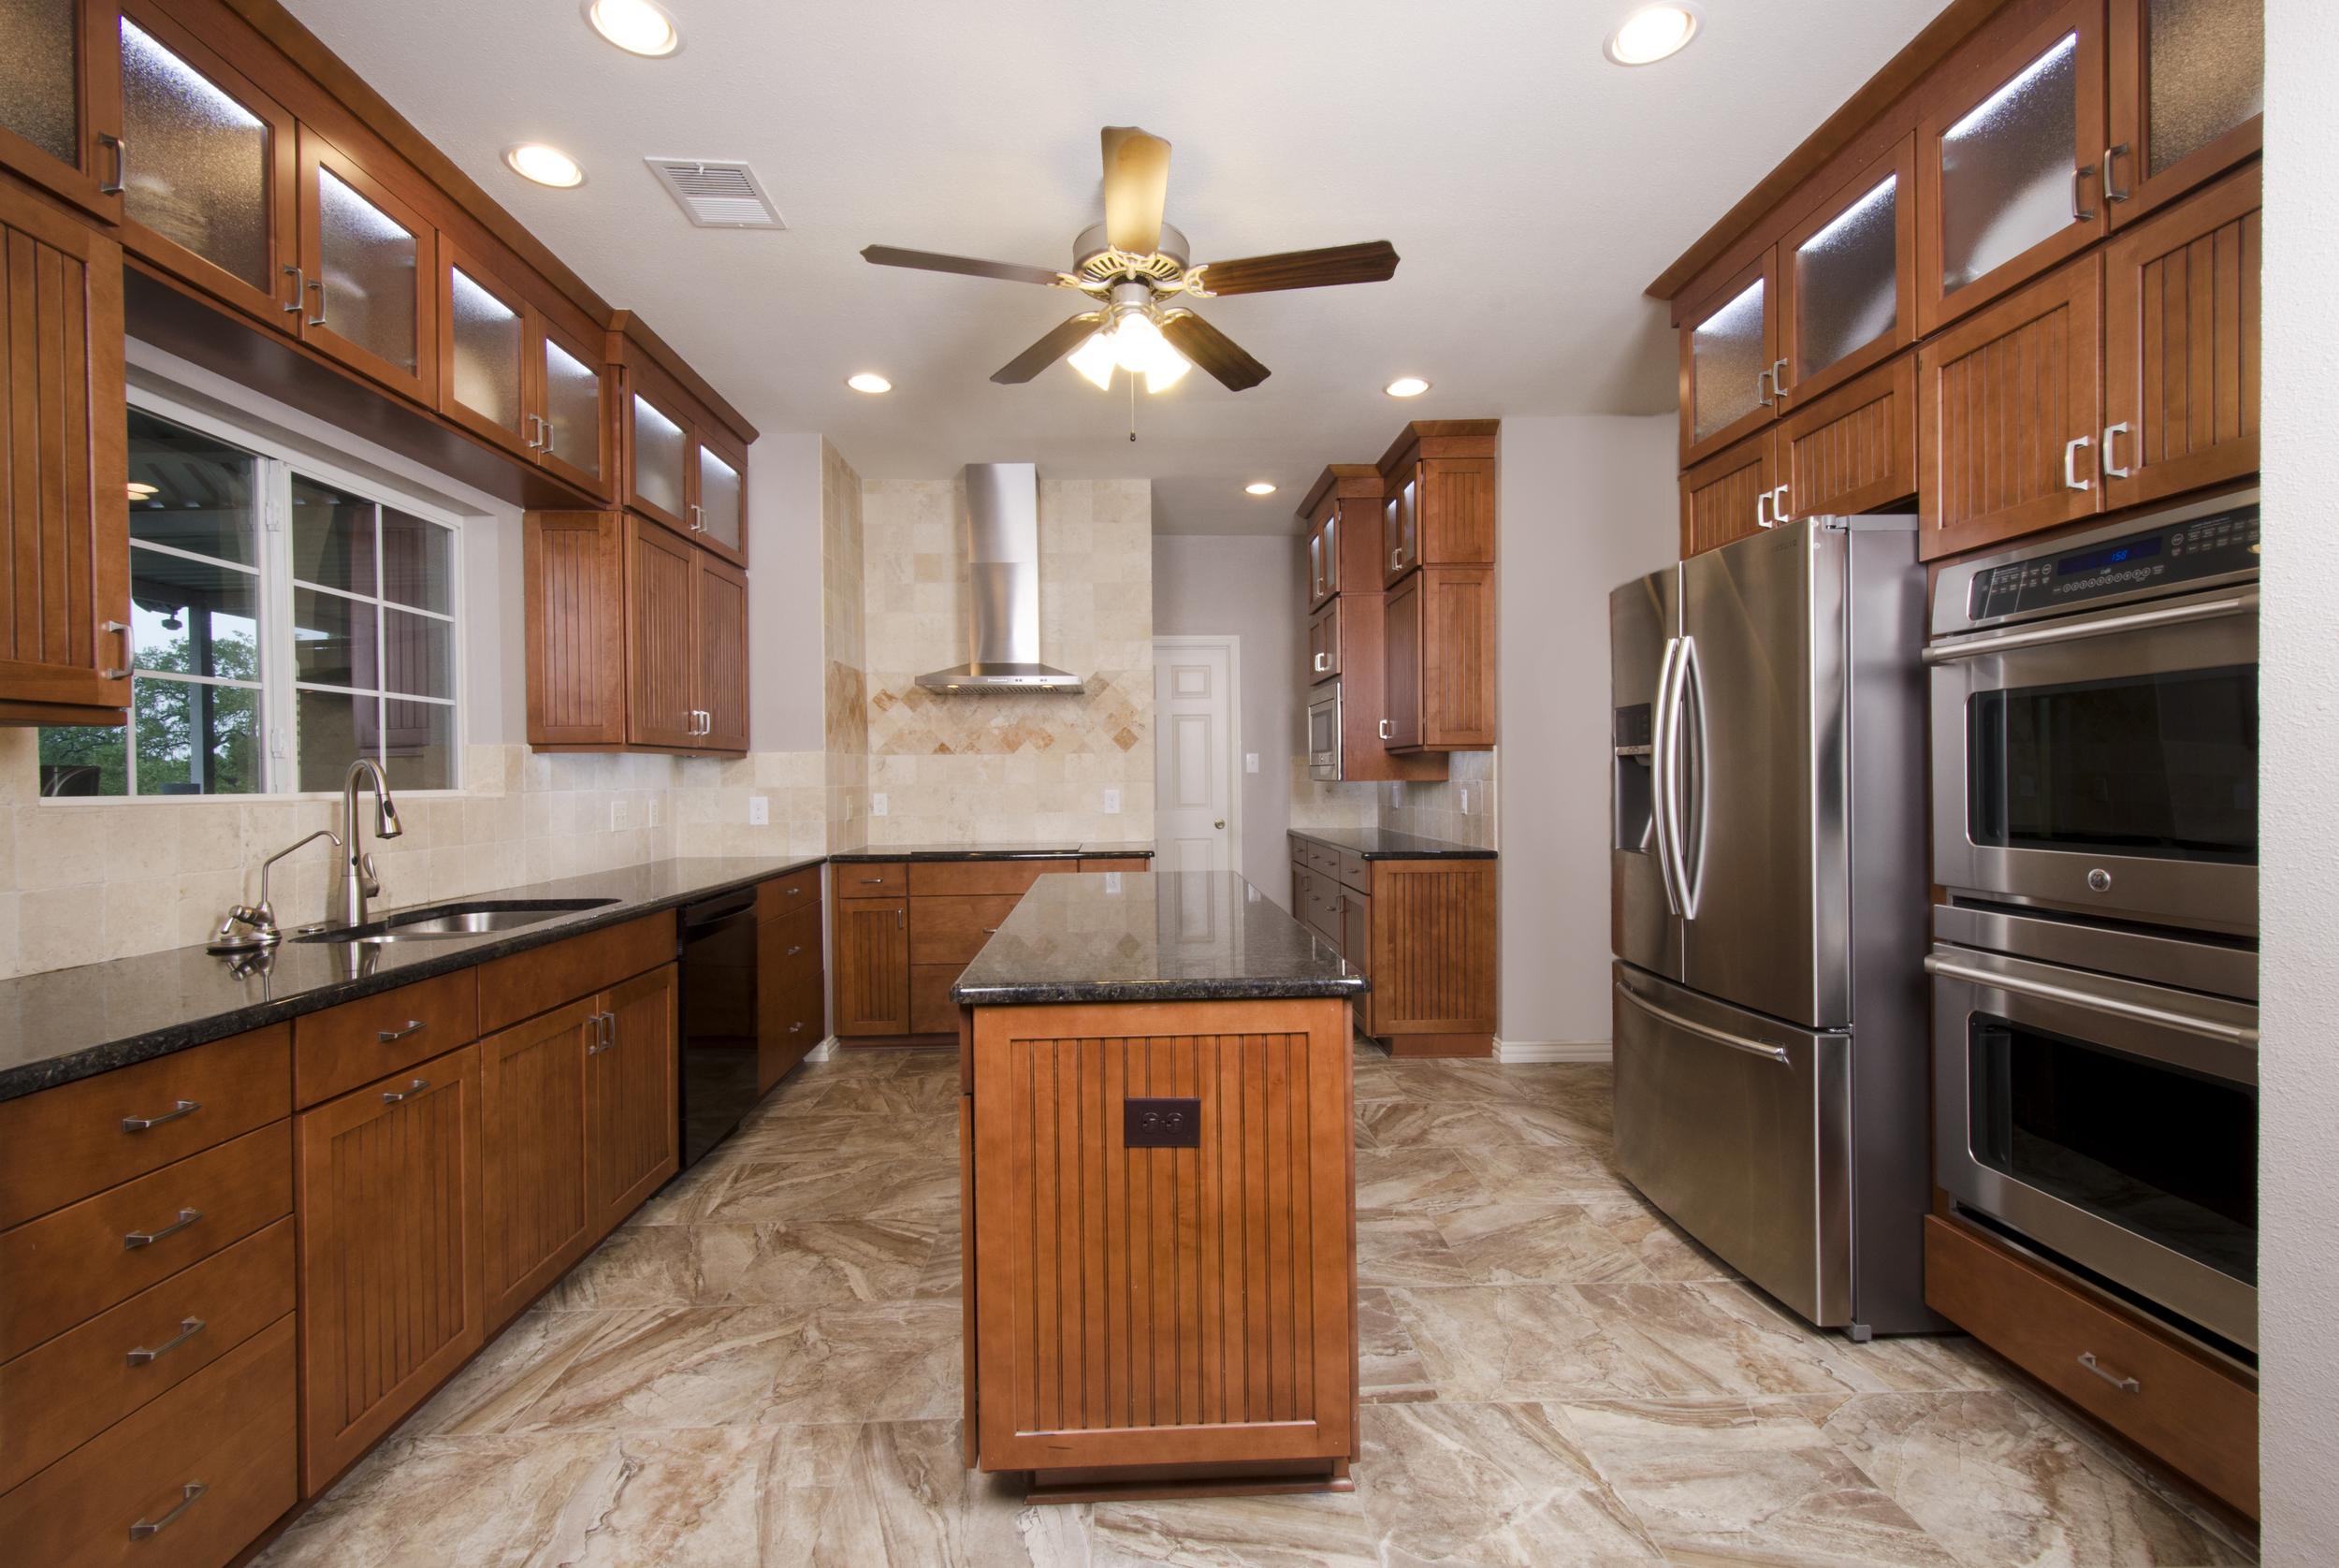 New-Braunfels_07_Rays-kitchen.jpg